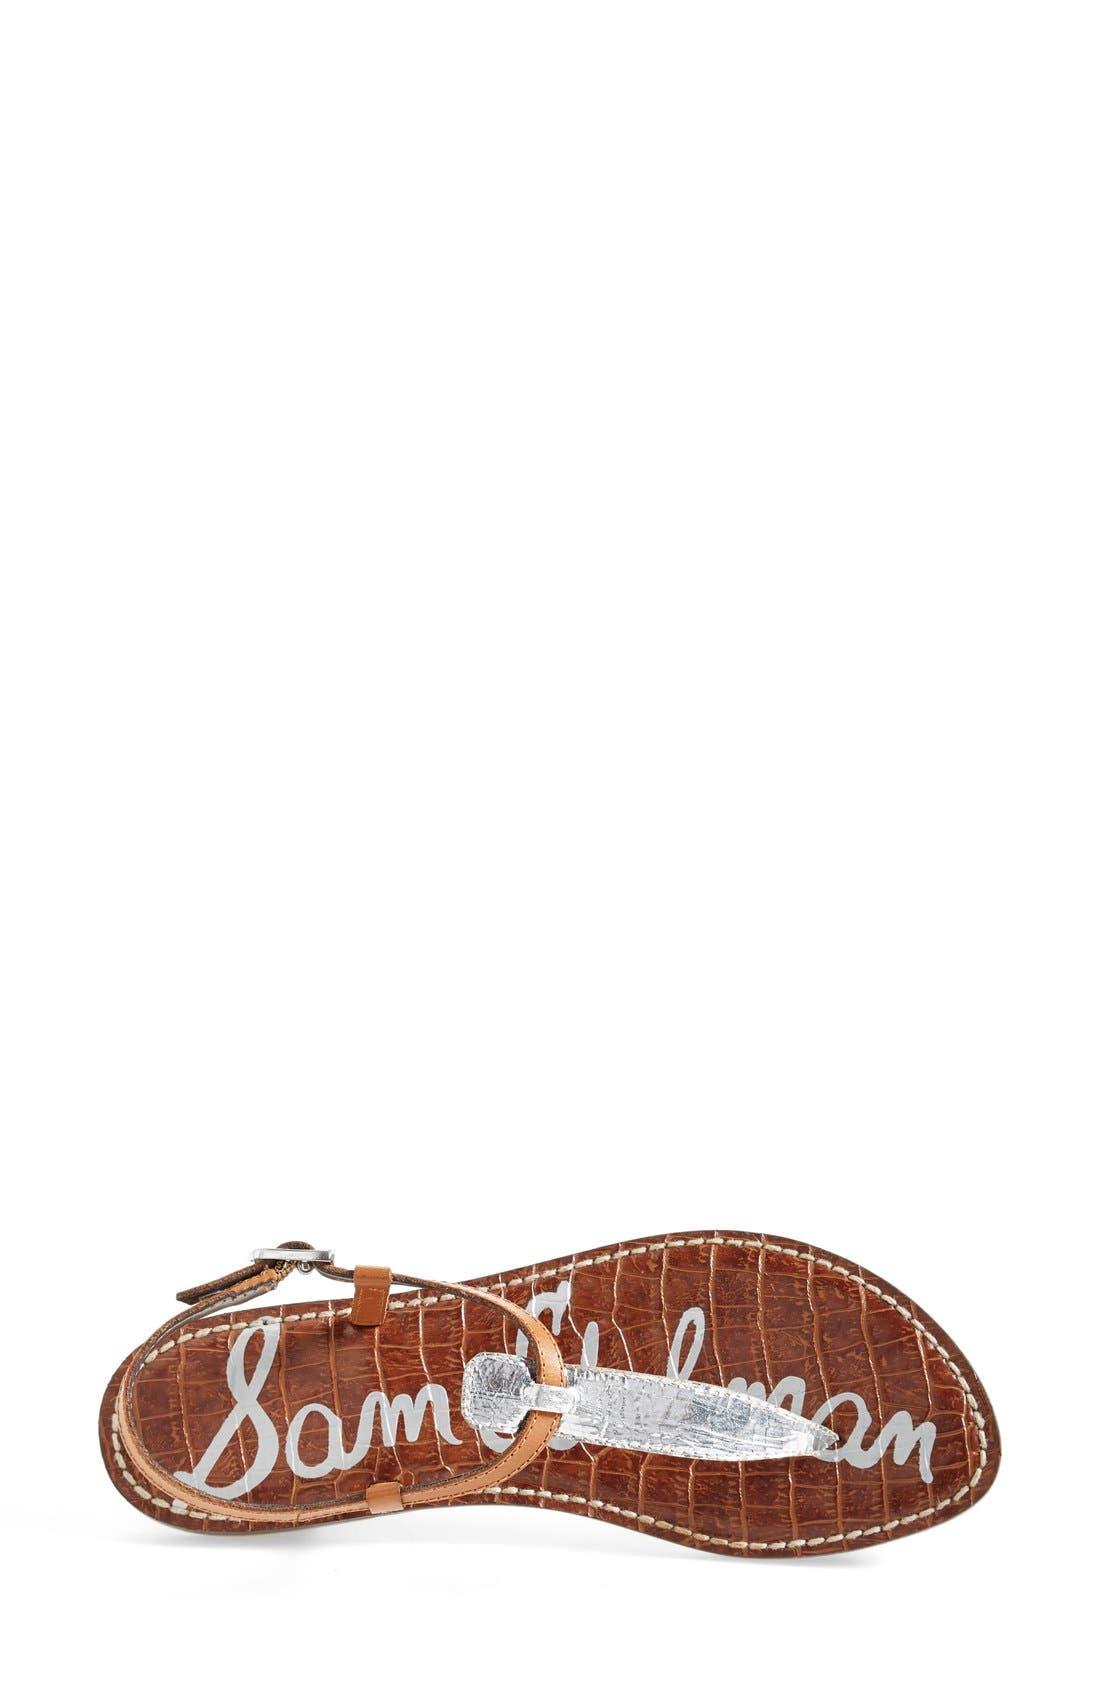 Alternate Image 3  - Sam Edelman 'Gigi' Leather Sandal (Women)